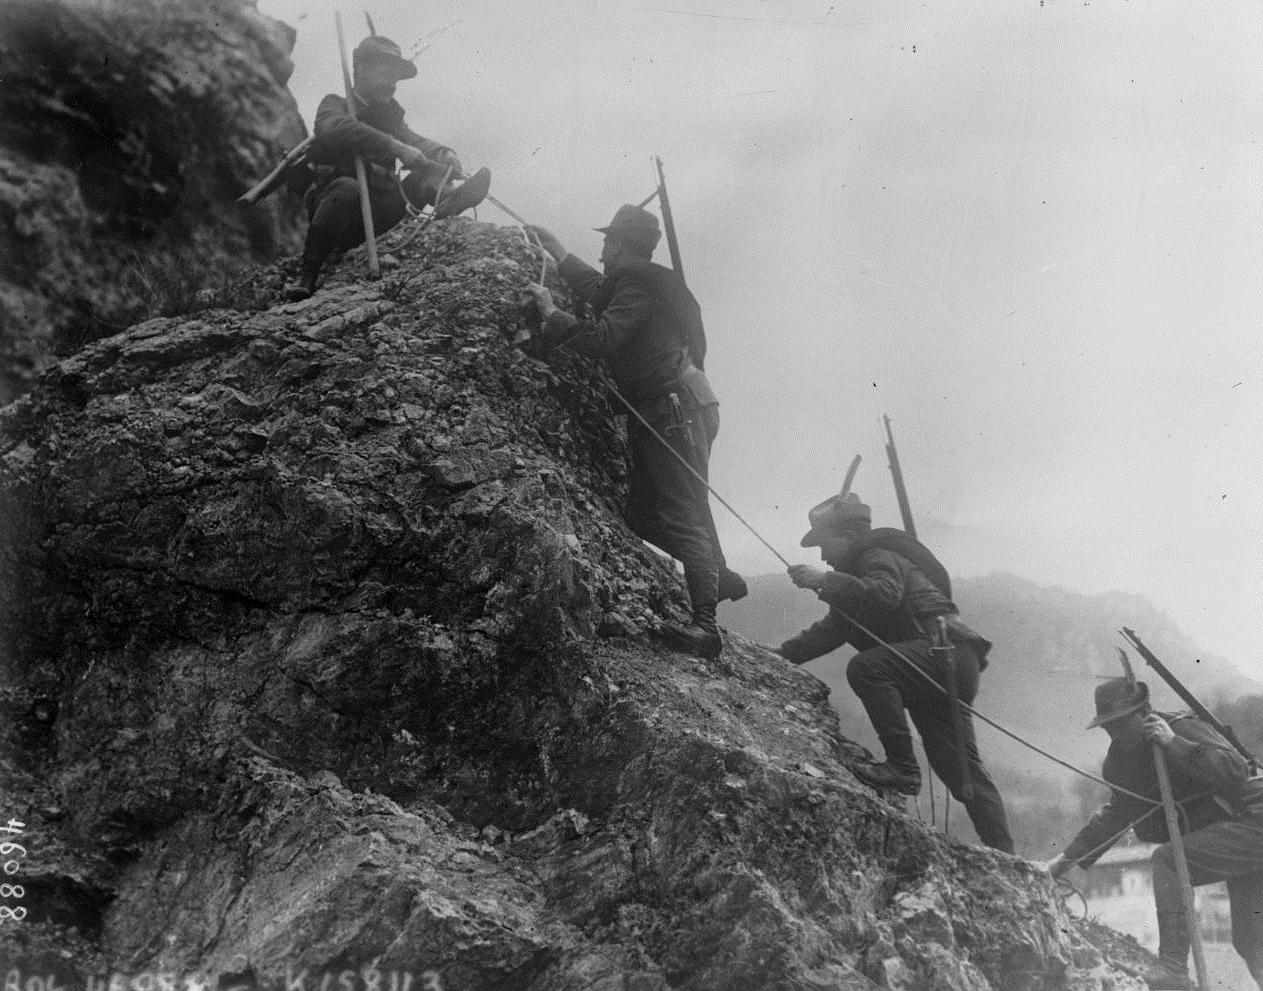 Italian Alpini in 1915 (Bibliothèque Nationale de France)